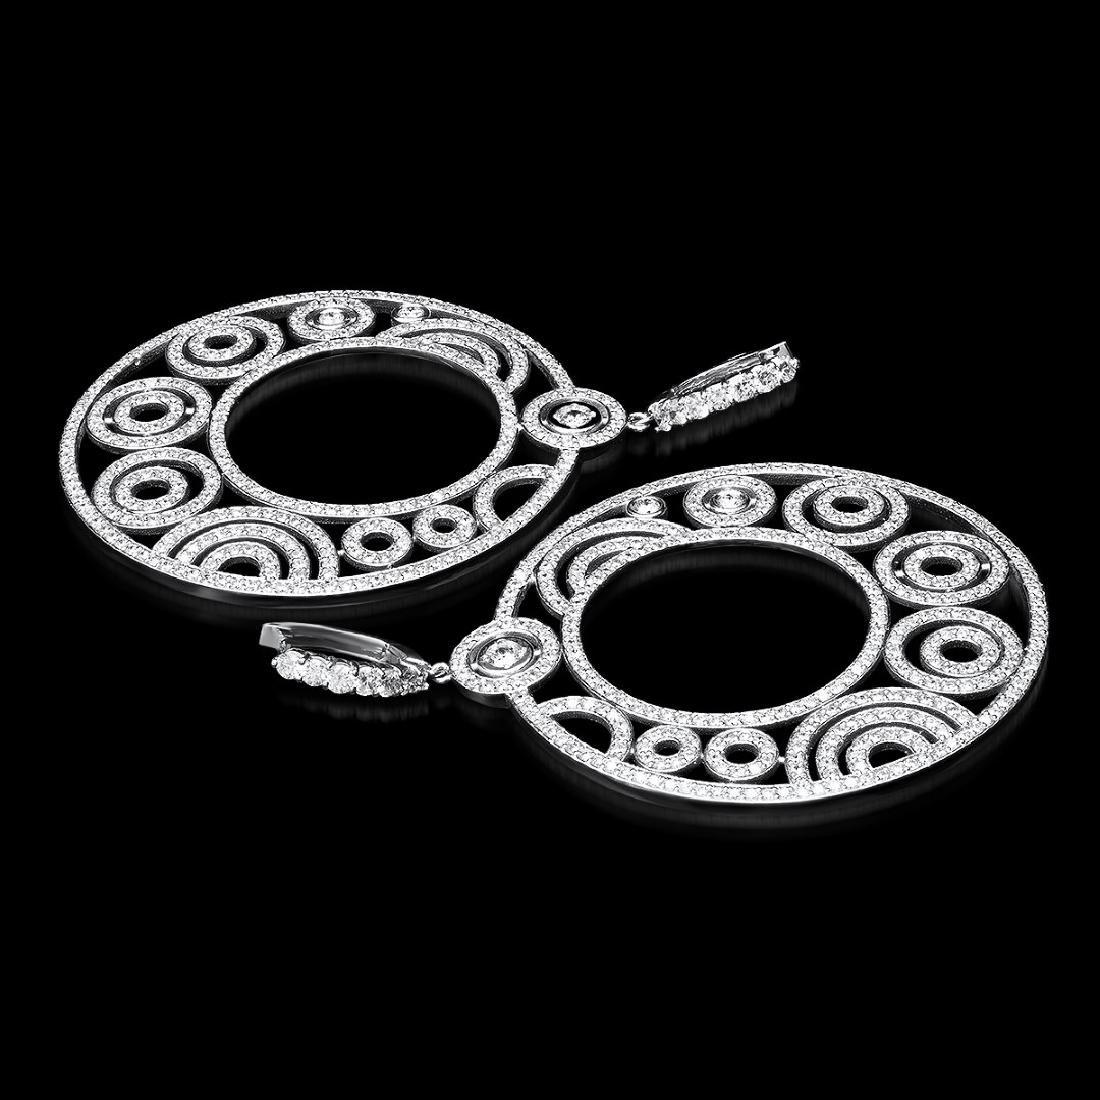 14K White Gold, 14.89cts. Diamond Earrings - 2